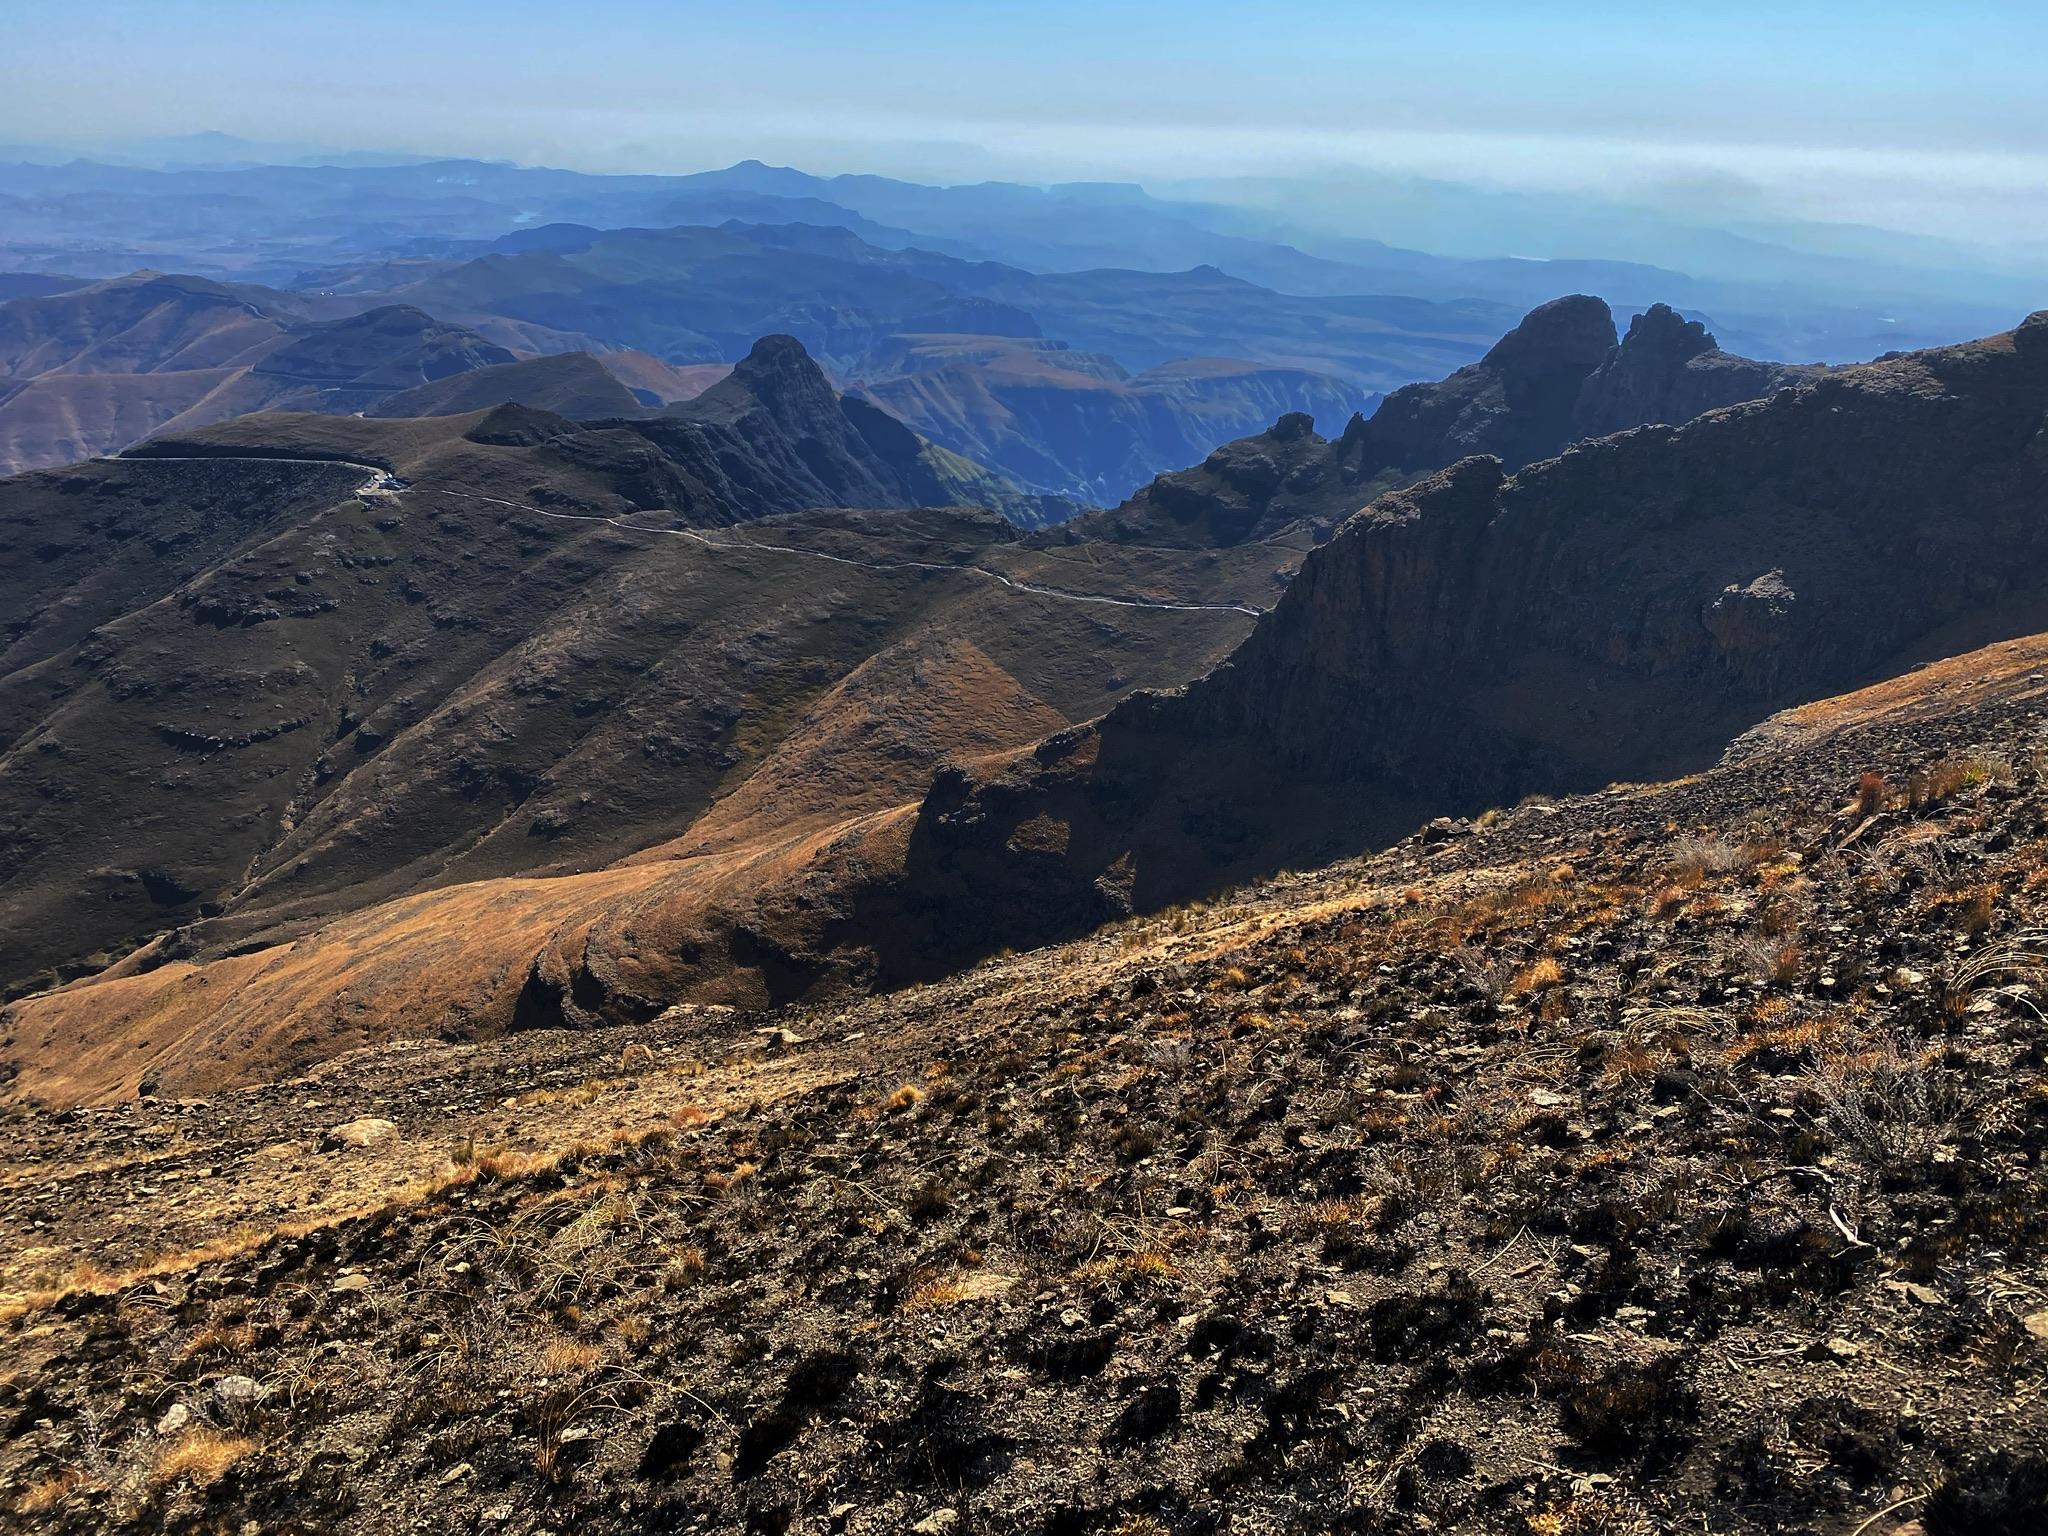 Views of the Drakensberg mountain range